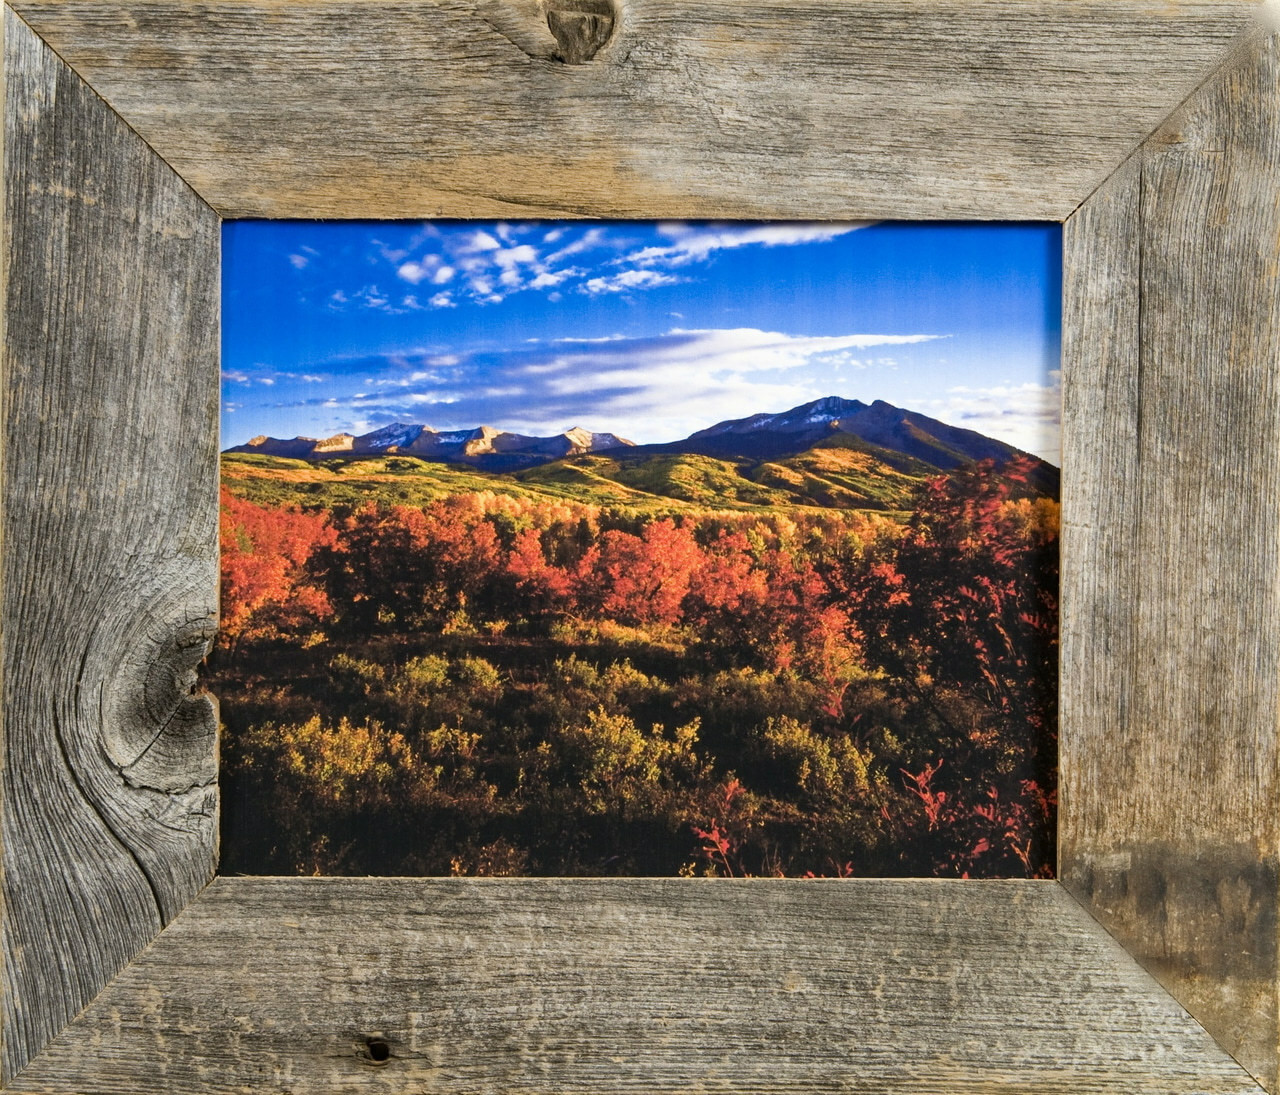 Barnwood Frames | Reclaimed Rustic Wood Frame 11x14